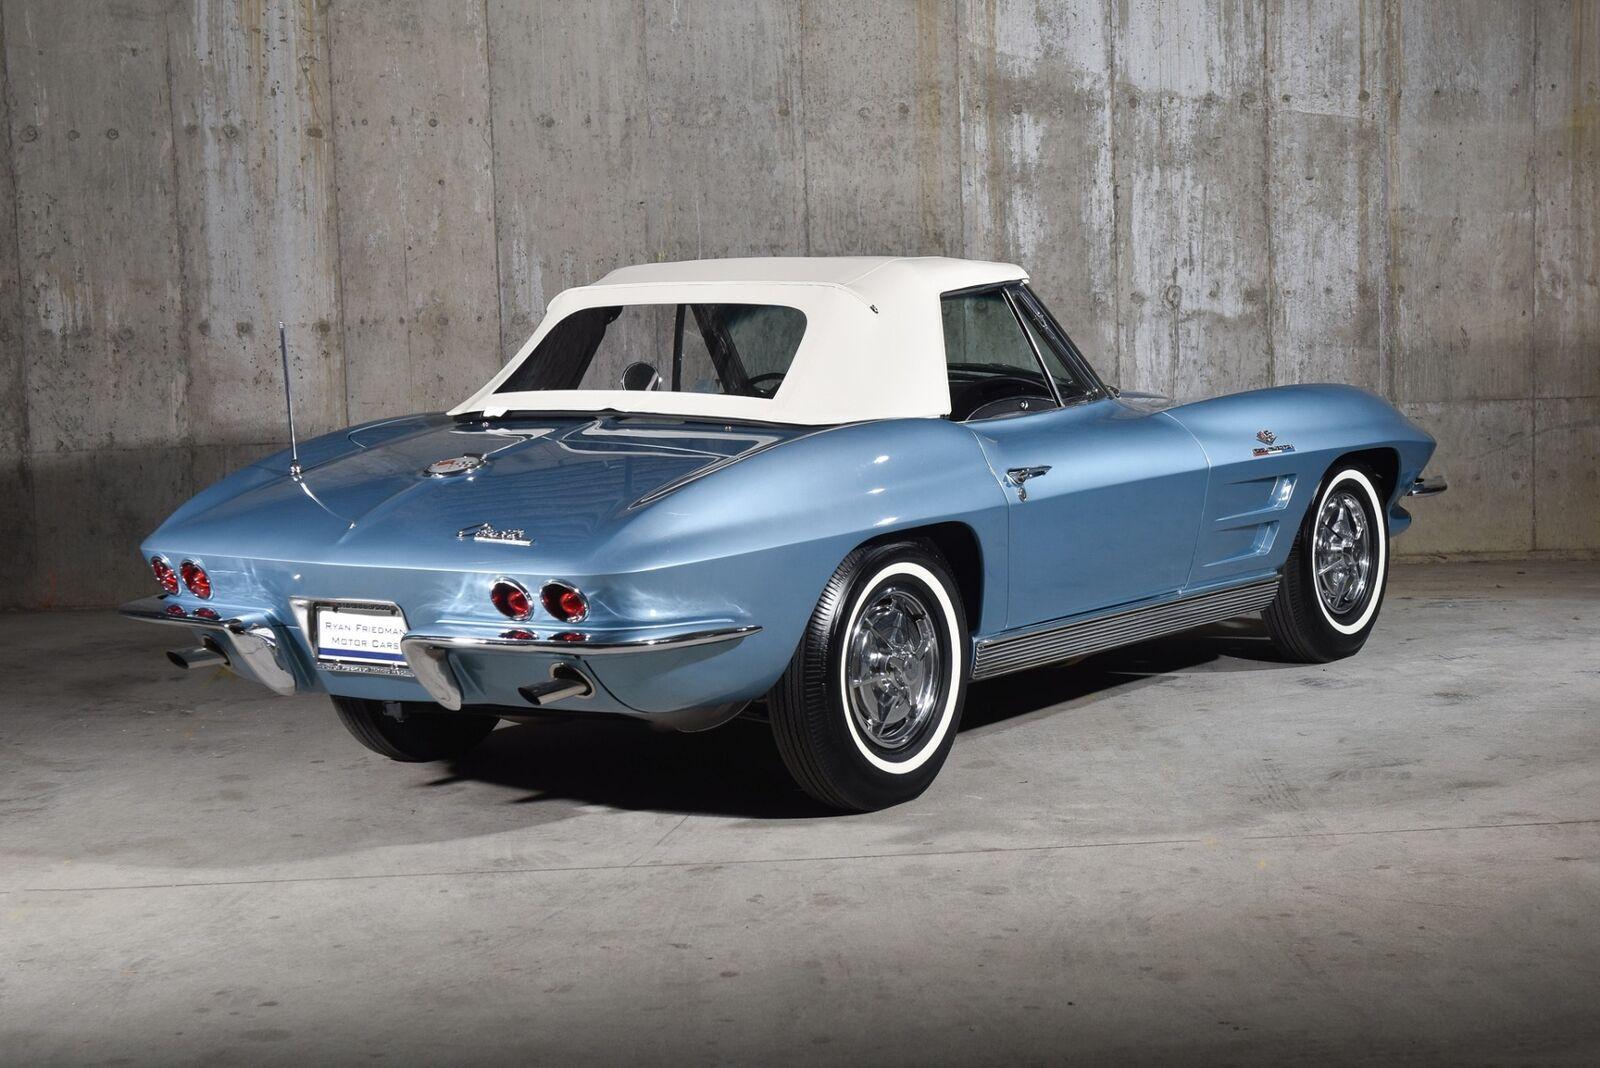 1963 Blue Chevrolet Corvette   | C2 Corvette Photo 6